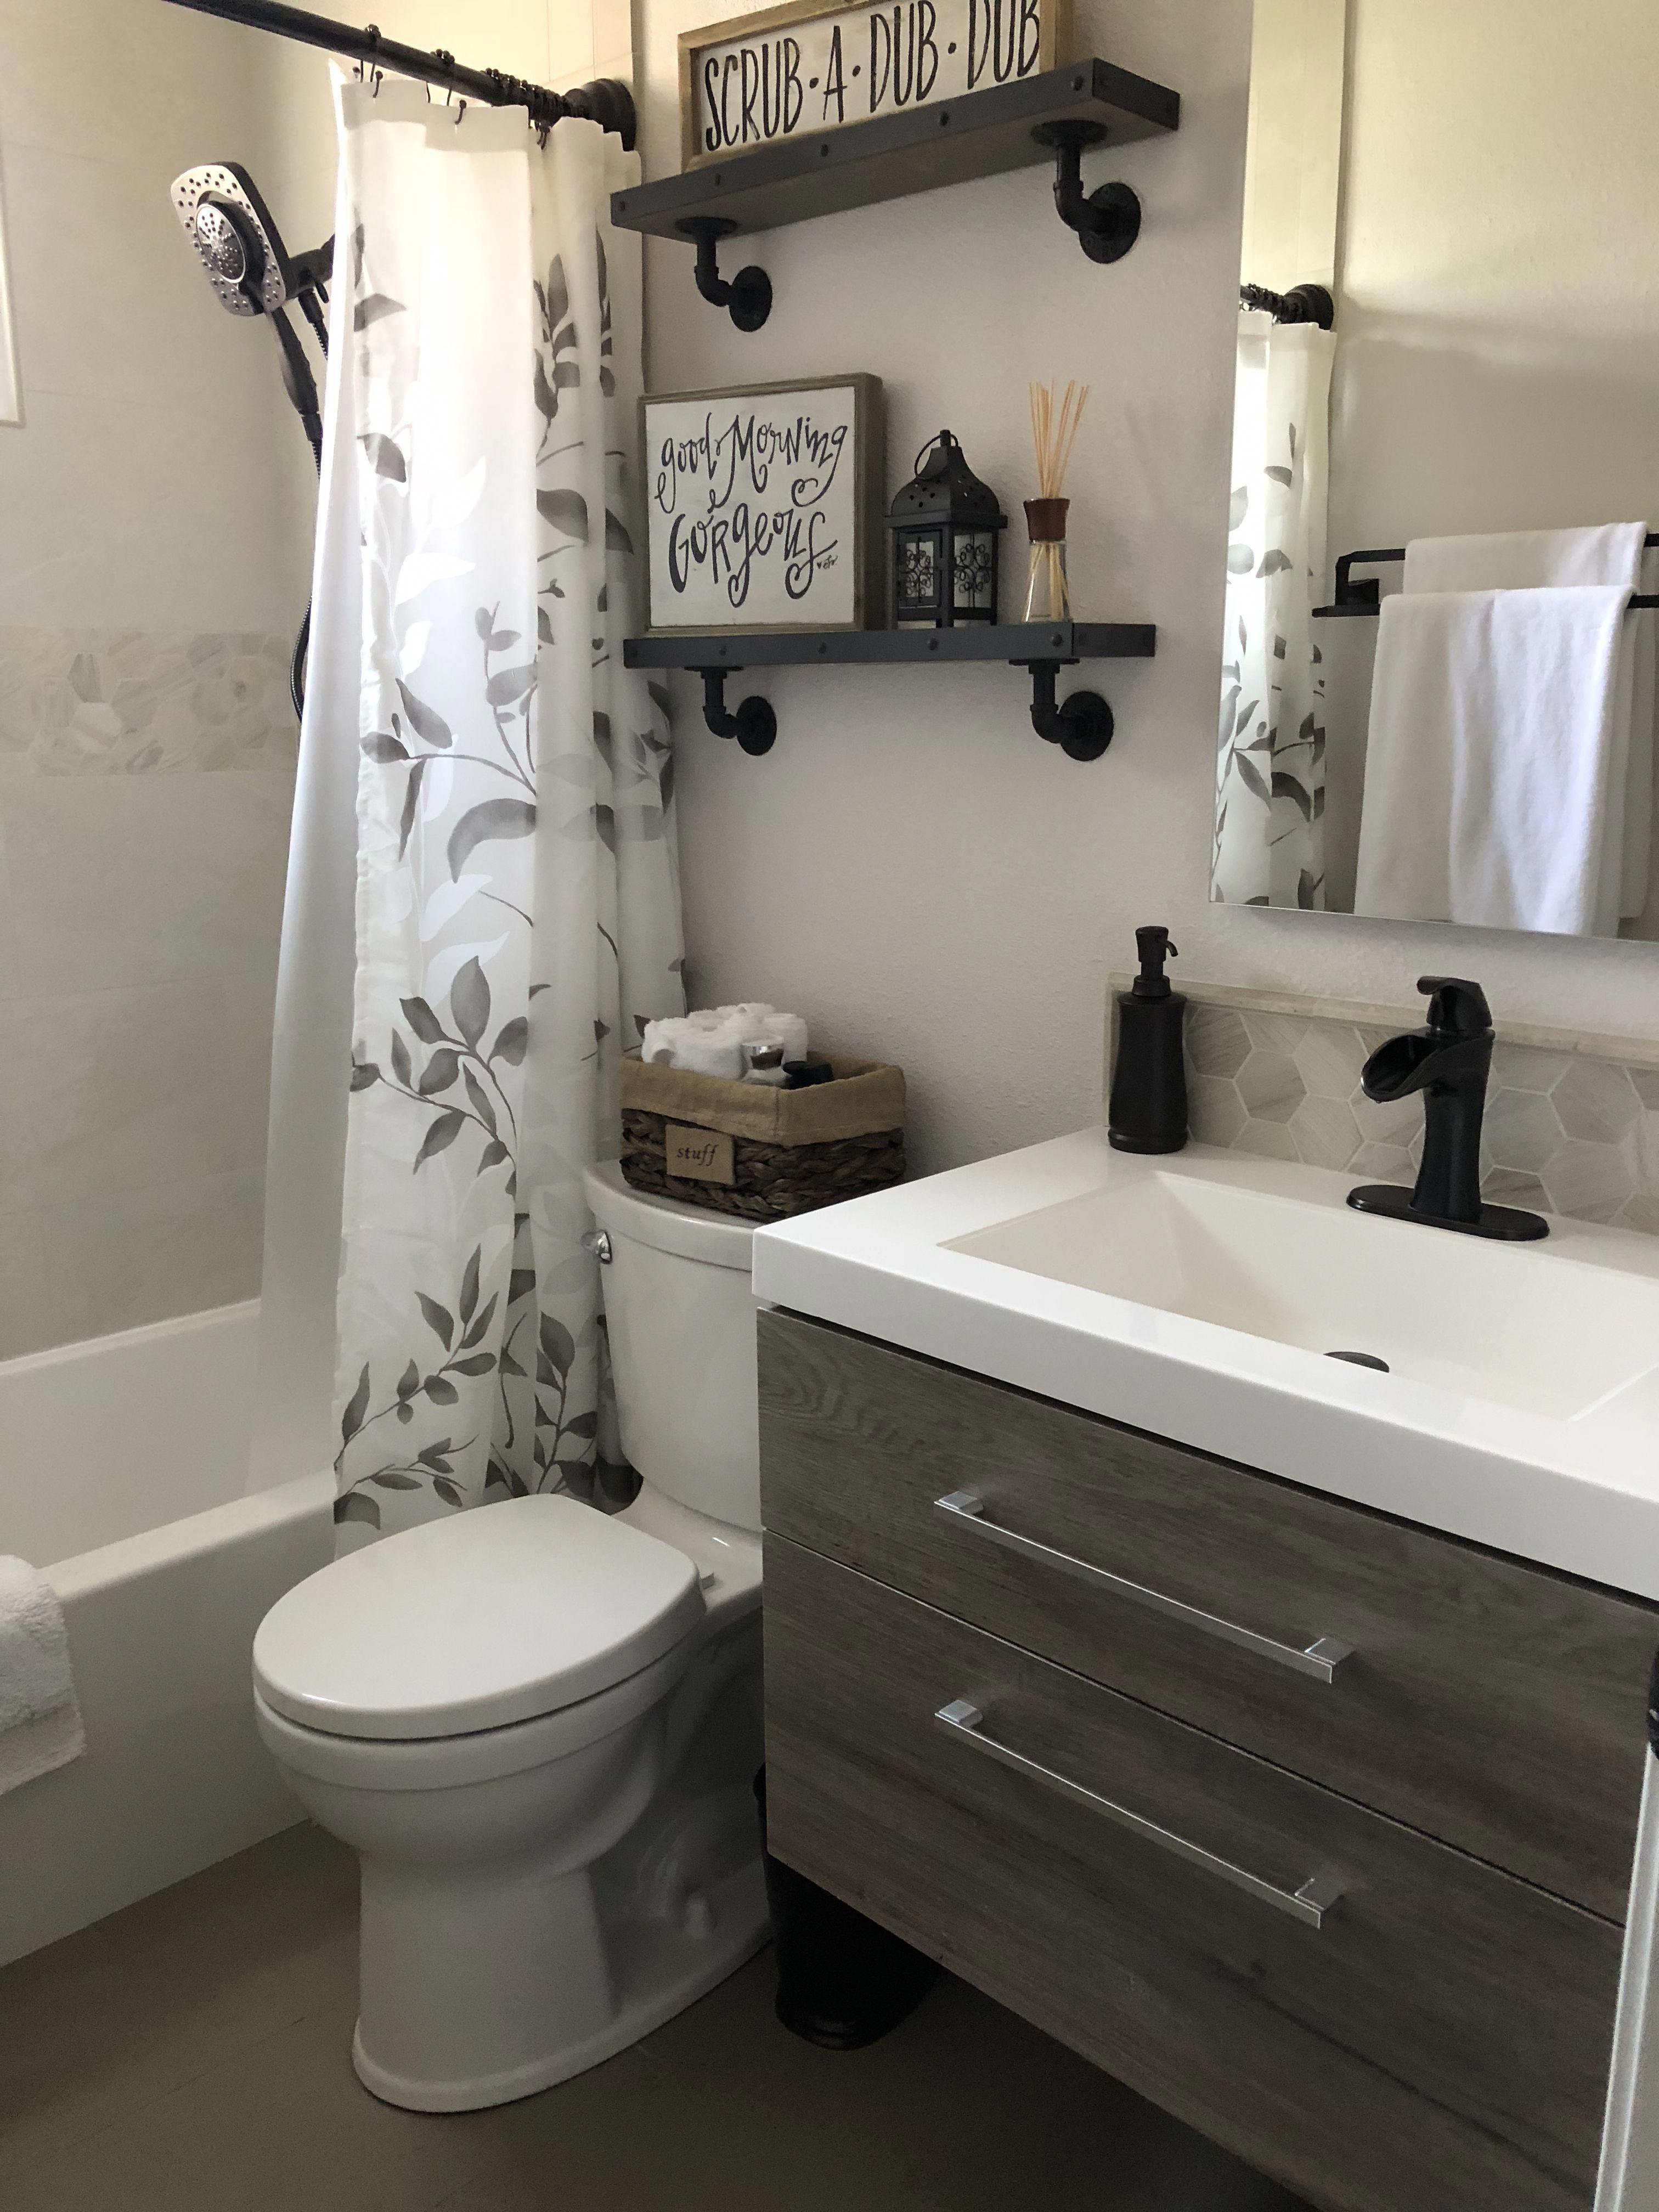 36 Beautiful Farmhouse Bathroom Decor Ideas You Will Go Crazy For Small Bathroom Remodel Small Bathroom Decor Bathroom Design Small